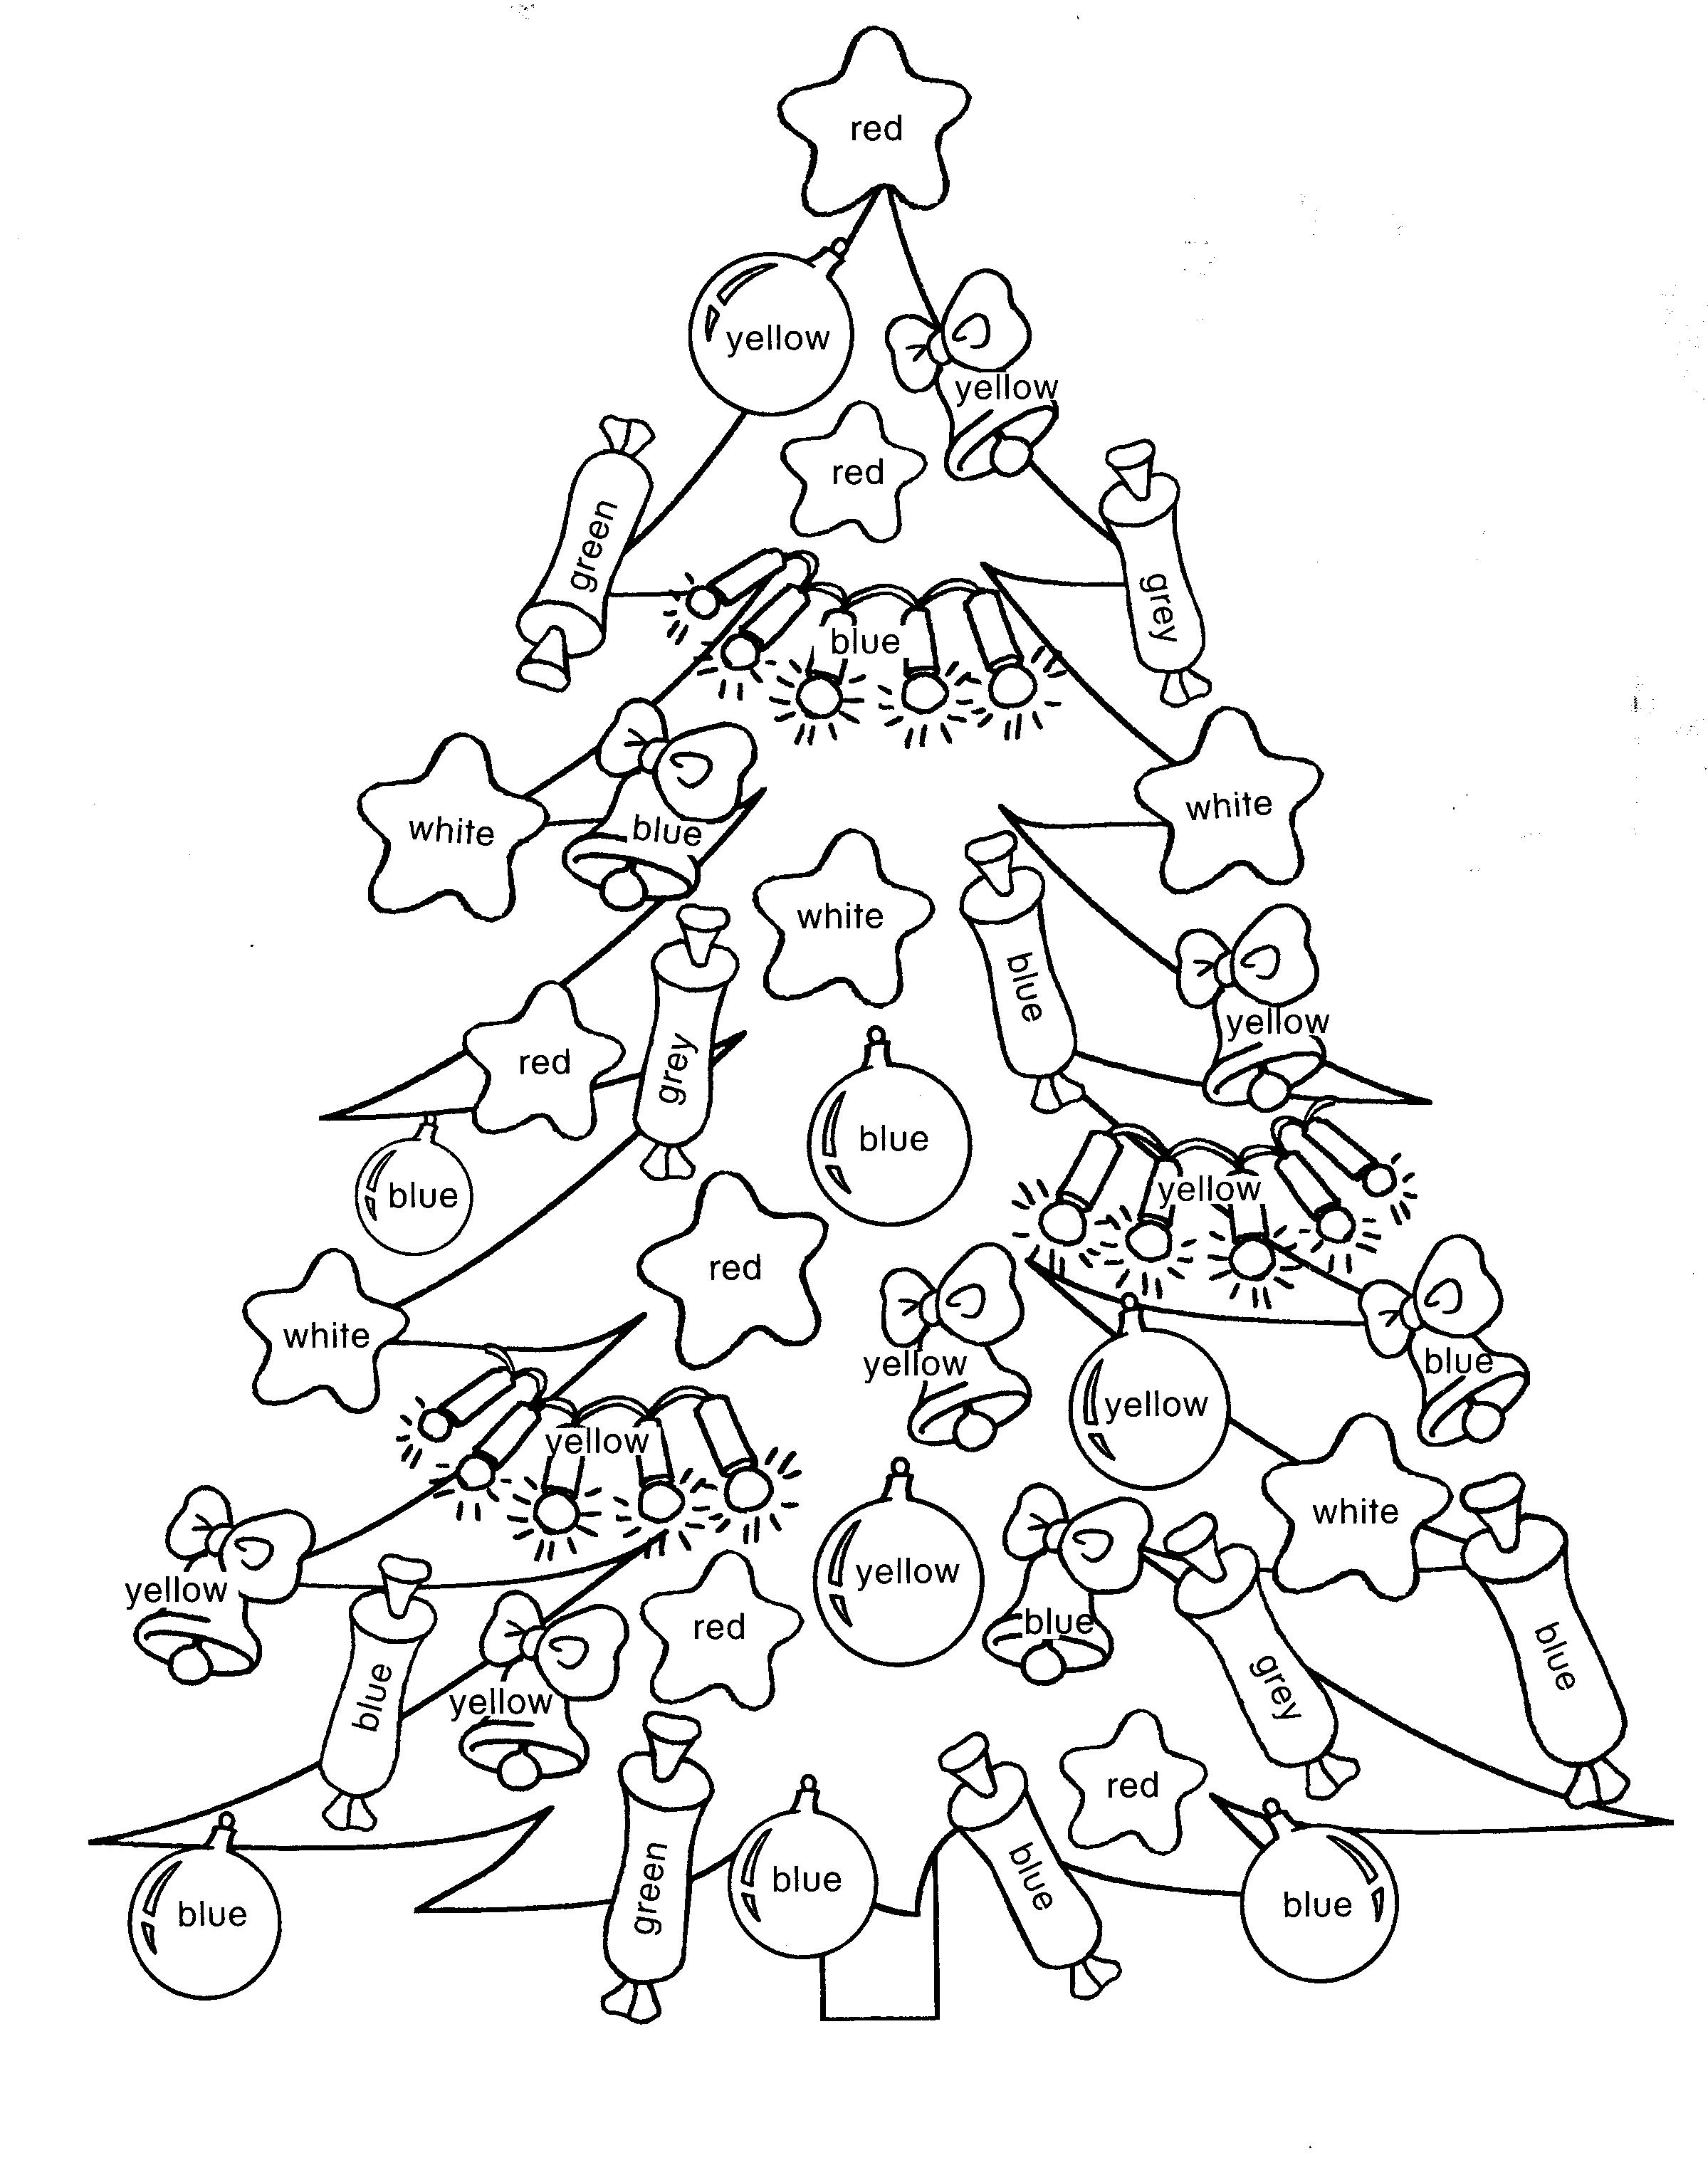 http://kopilkaurokov.ru/uploads/user_file_5678594bc7bd2/vnieklassnoie-mieropriiatiie-po-tiemie-merry-christmas_1.png